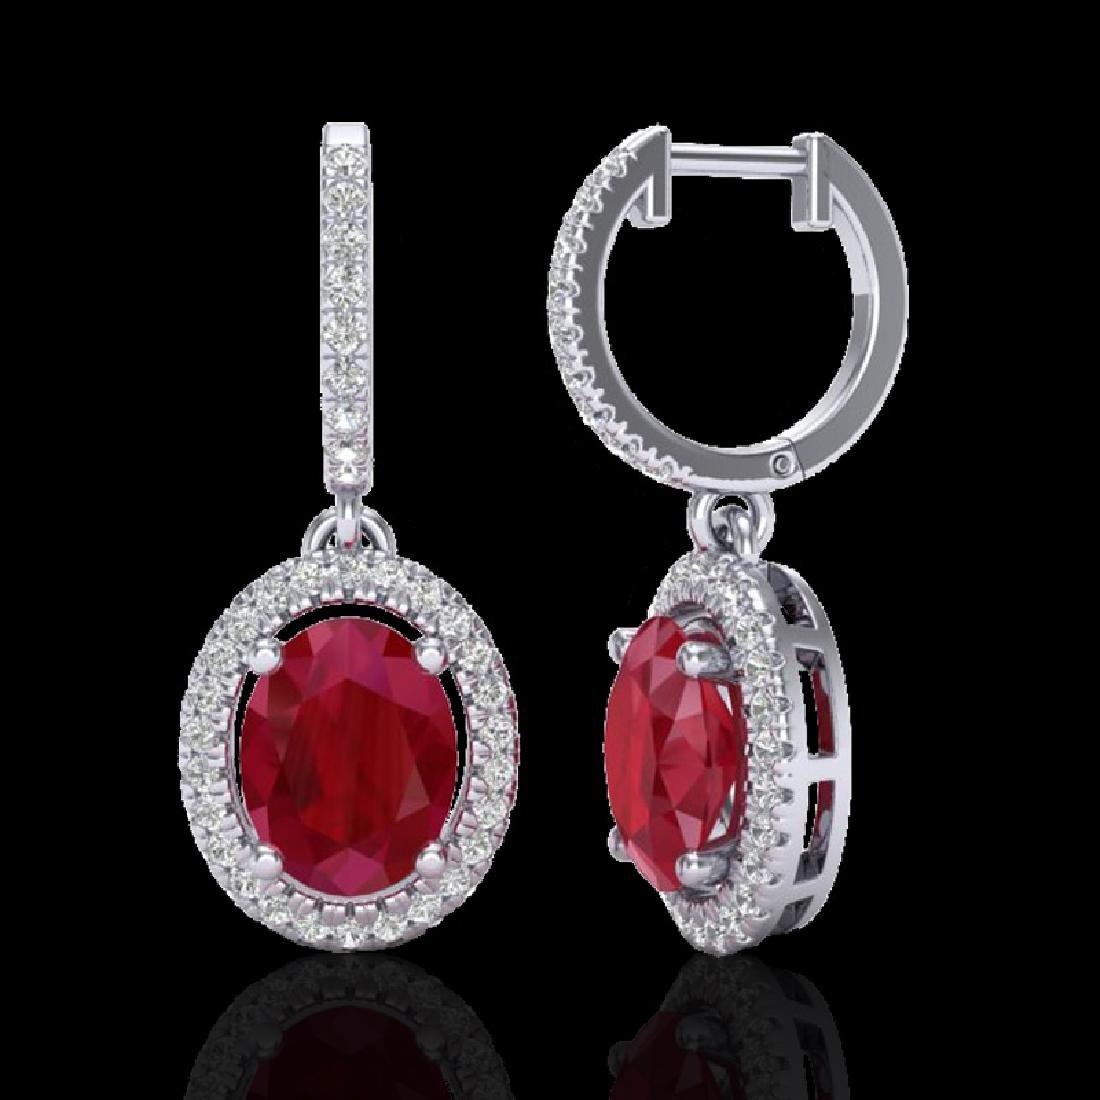 4.25 CTW Ruby & Micro Pave VS/SI Diamond Earrings - 2